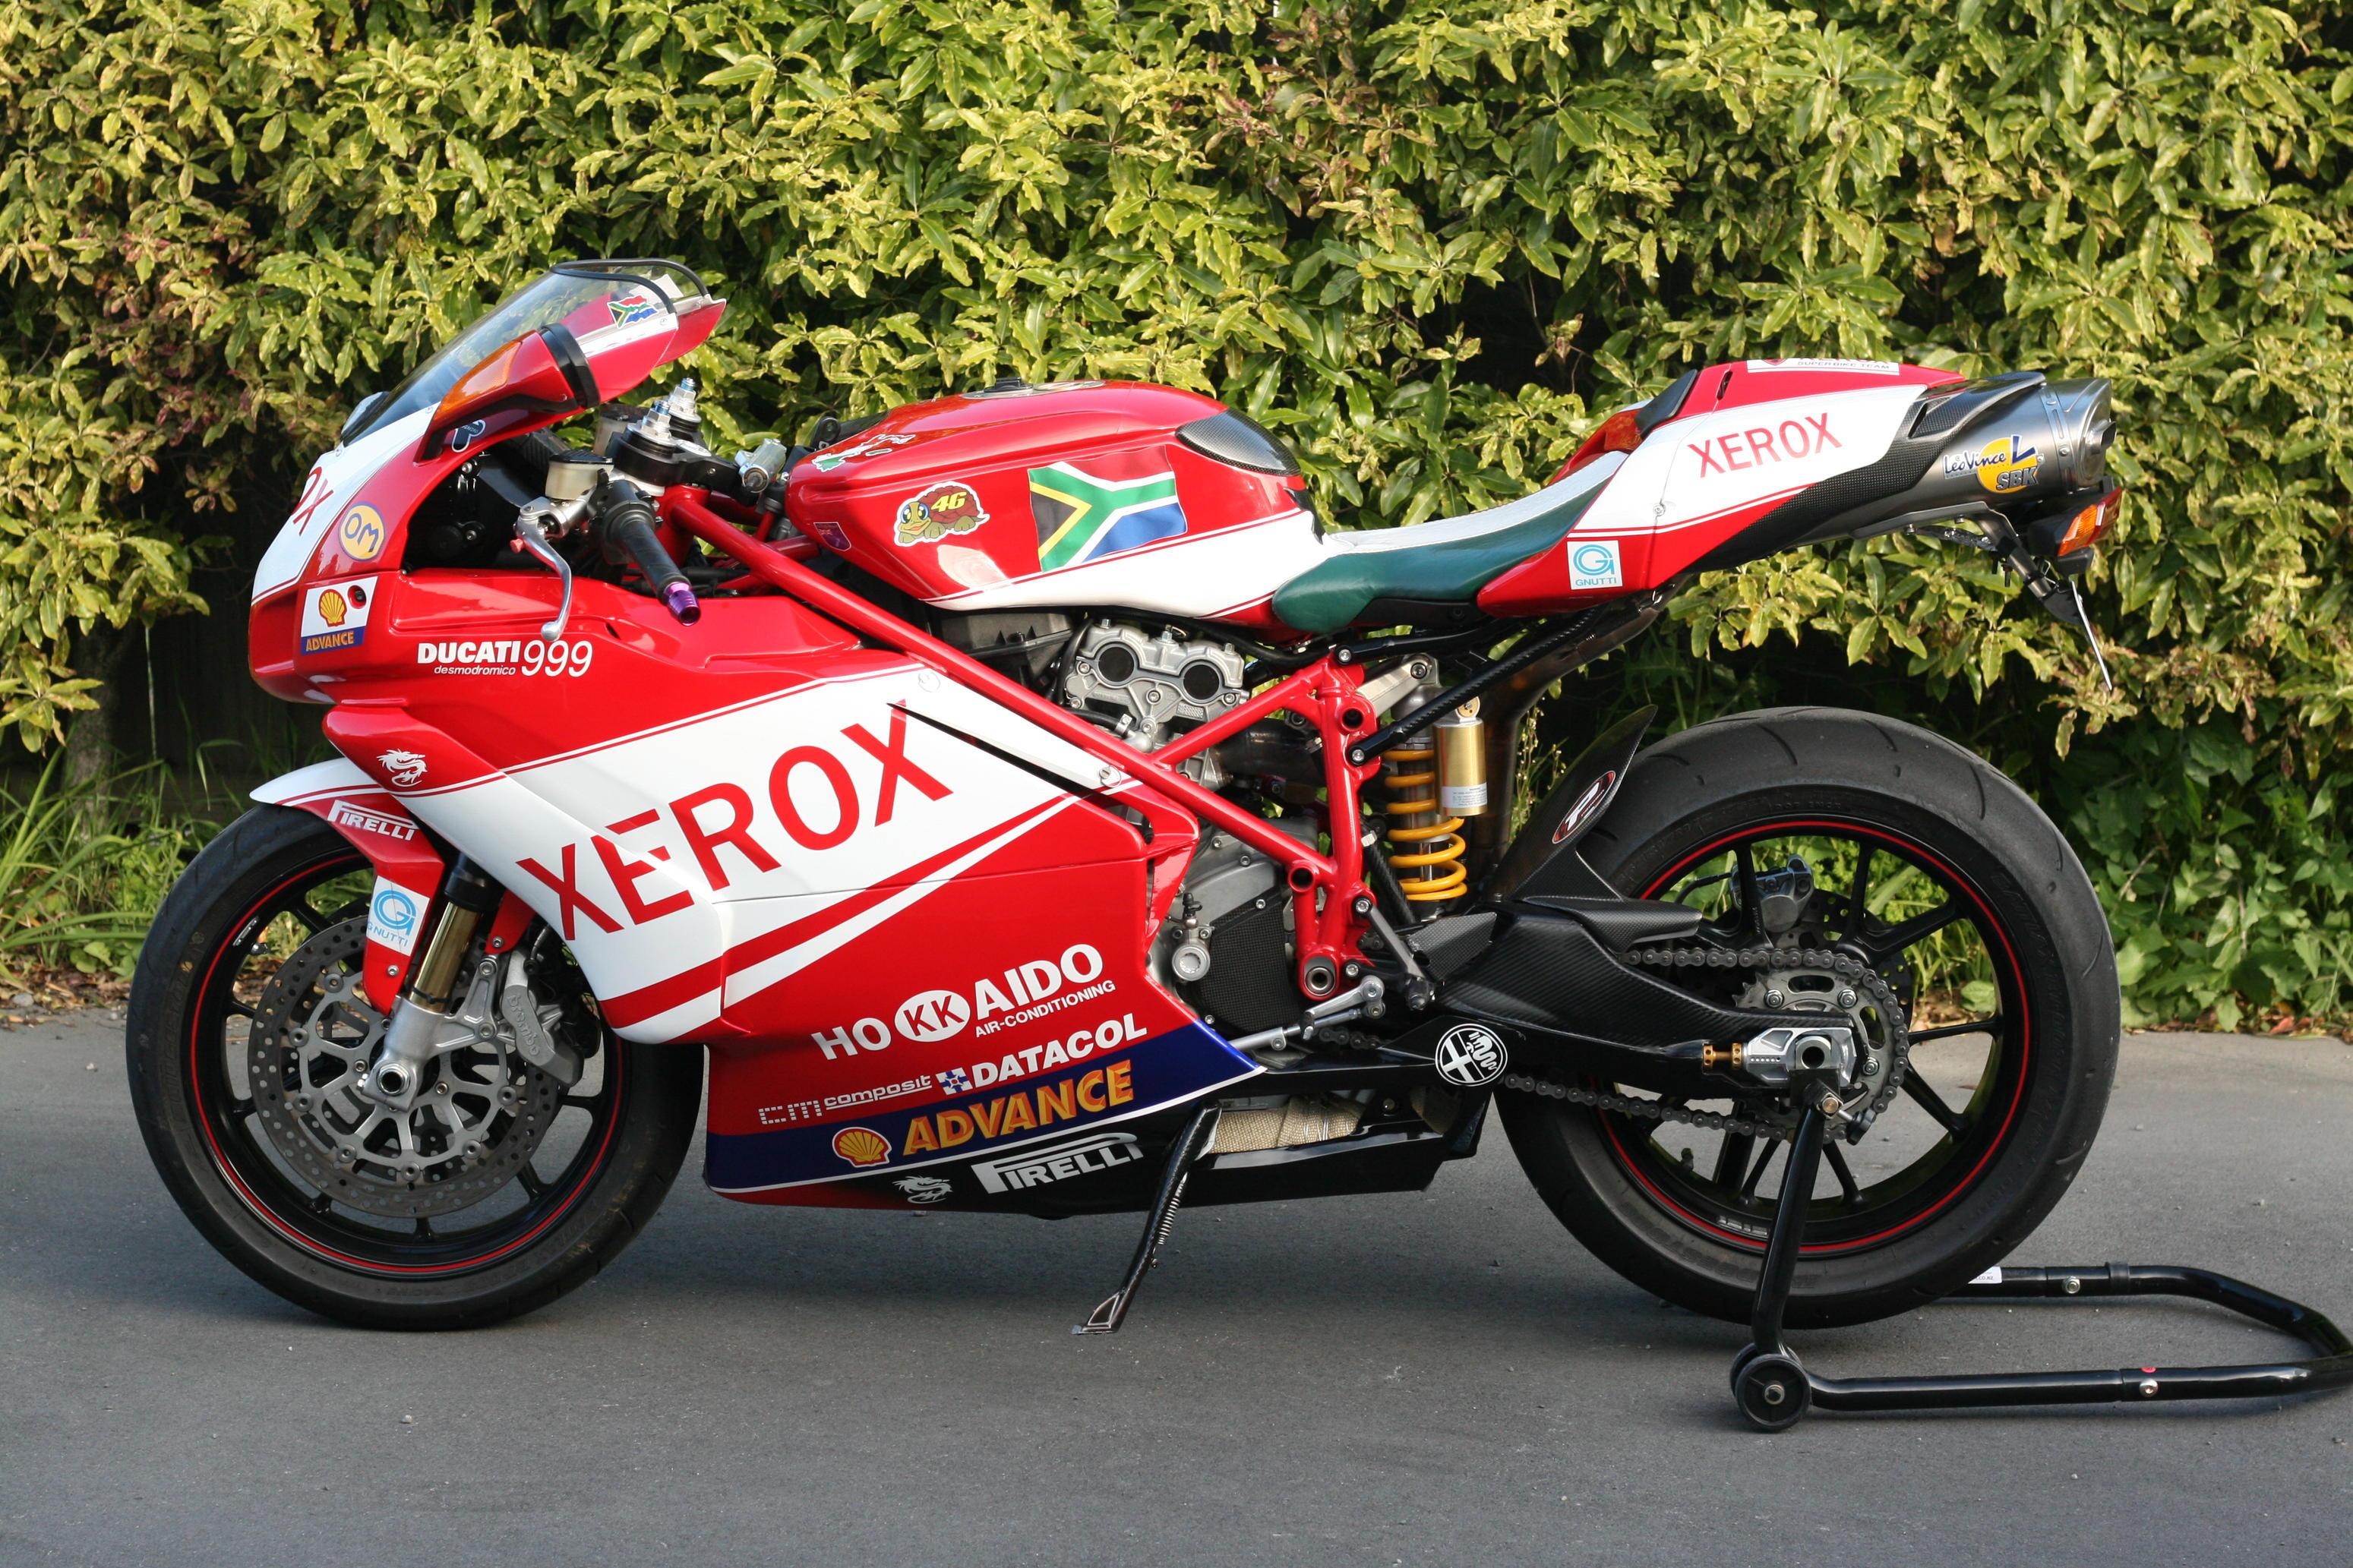 Ducati Enthusiasts